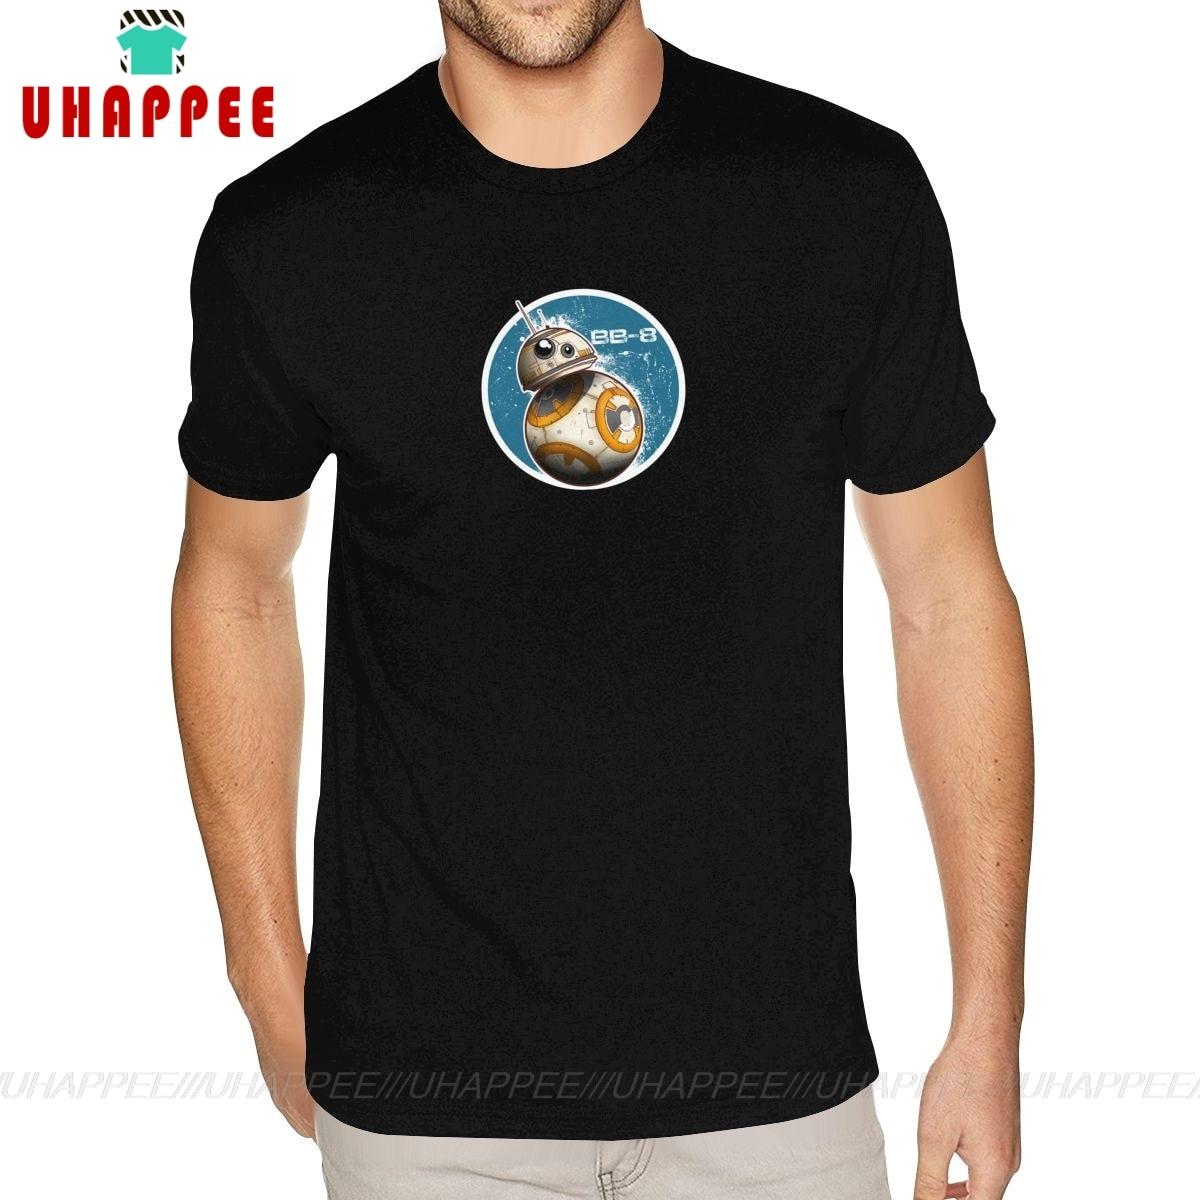 Creat Own BB-8 On The Move Tees, футболка большого размера для мальчиков, черная футболка